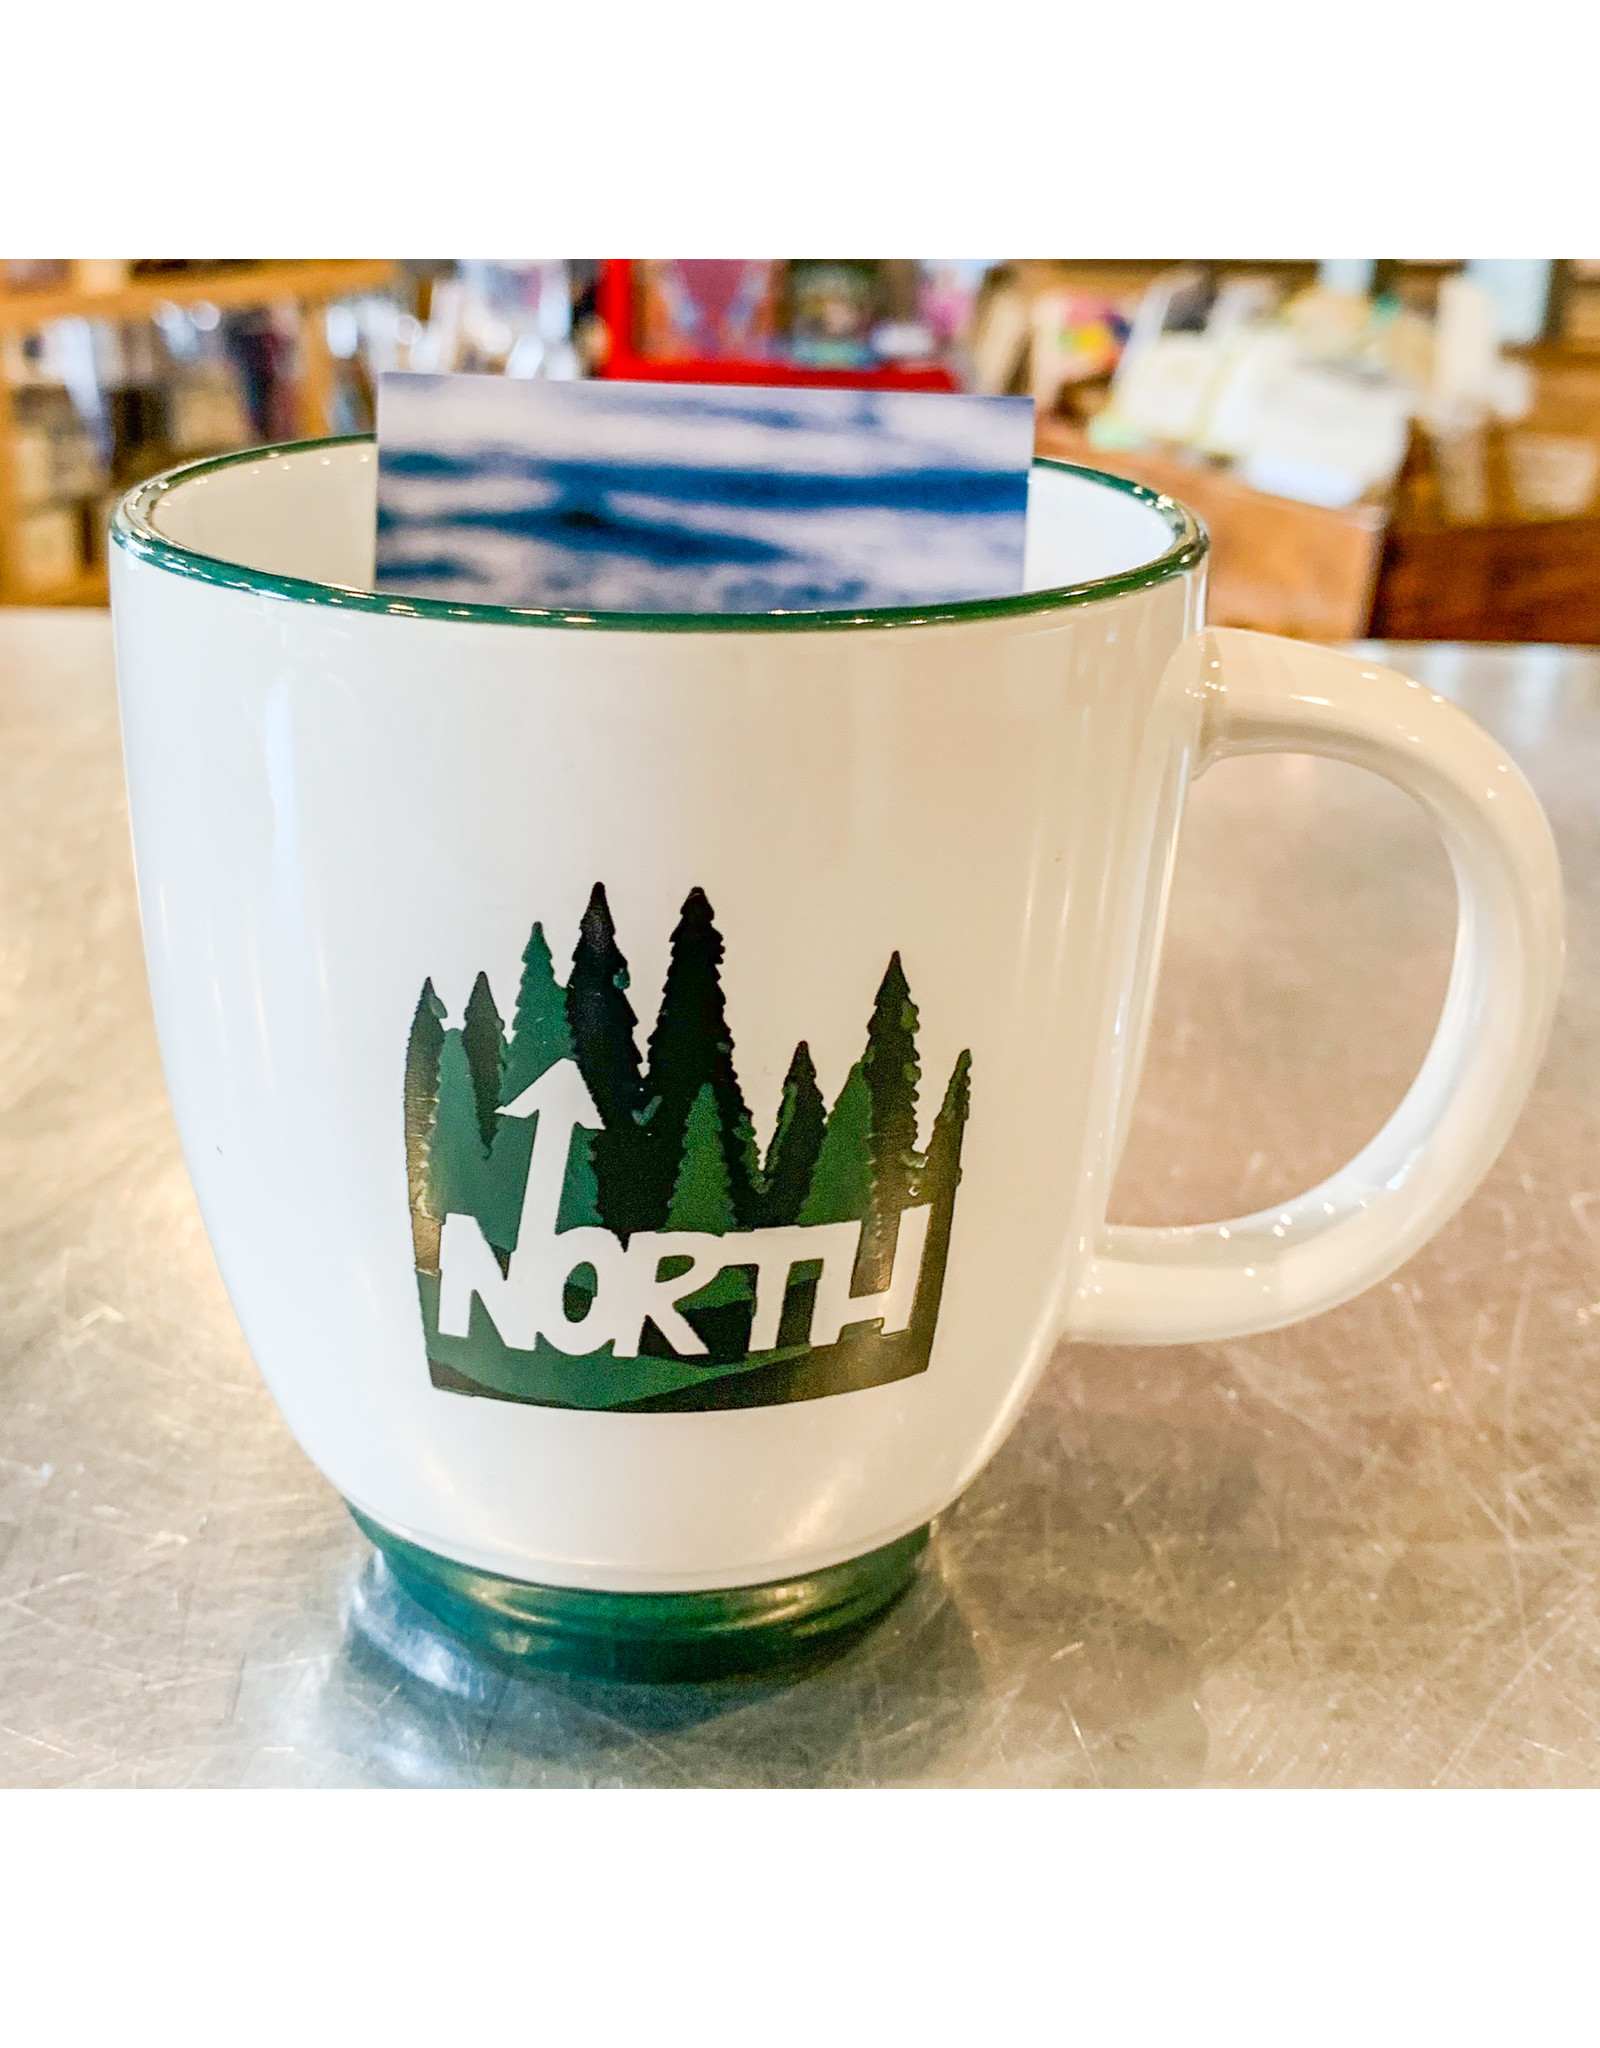 Northern Glasses North Coffee Mugs